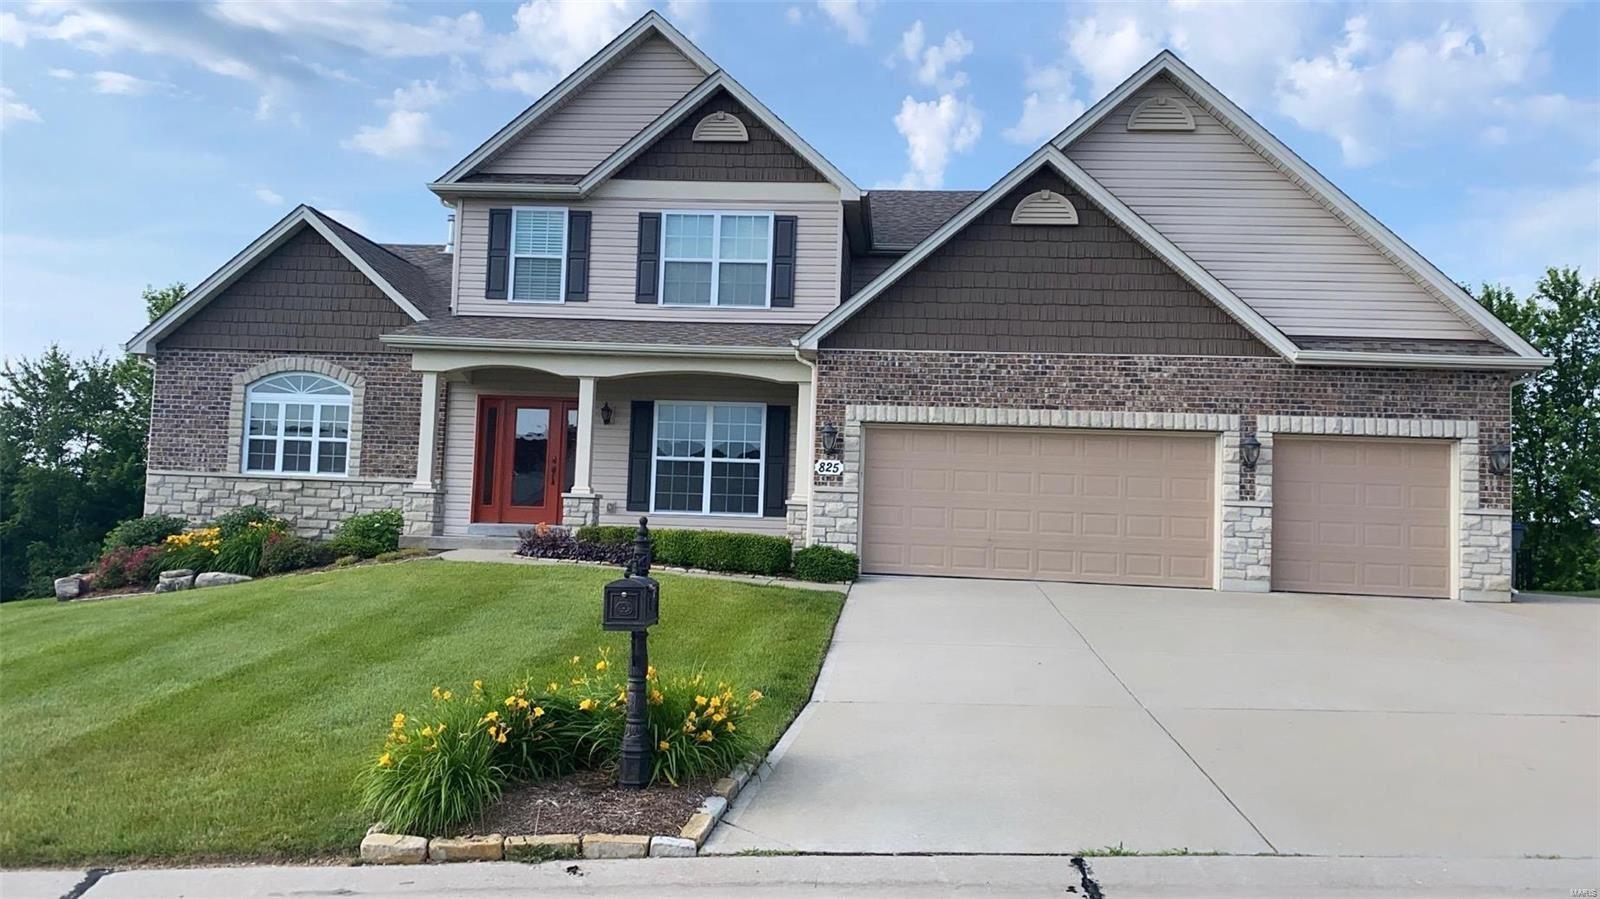 Photo for 825 Snowberry Ridge Drive, OFallon, MO 63366 (MLS # 21065330)